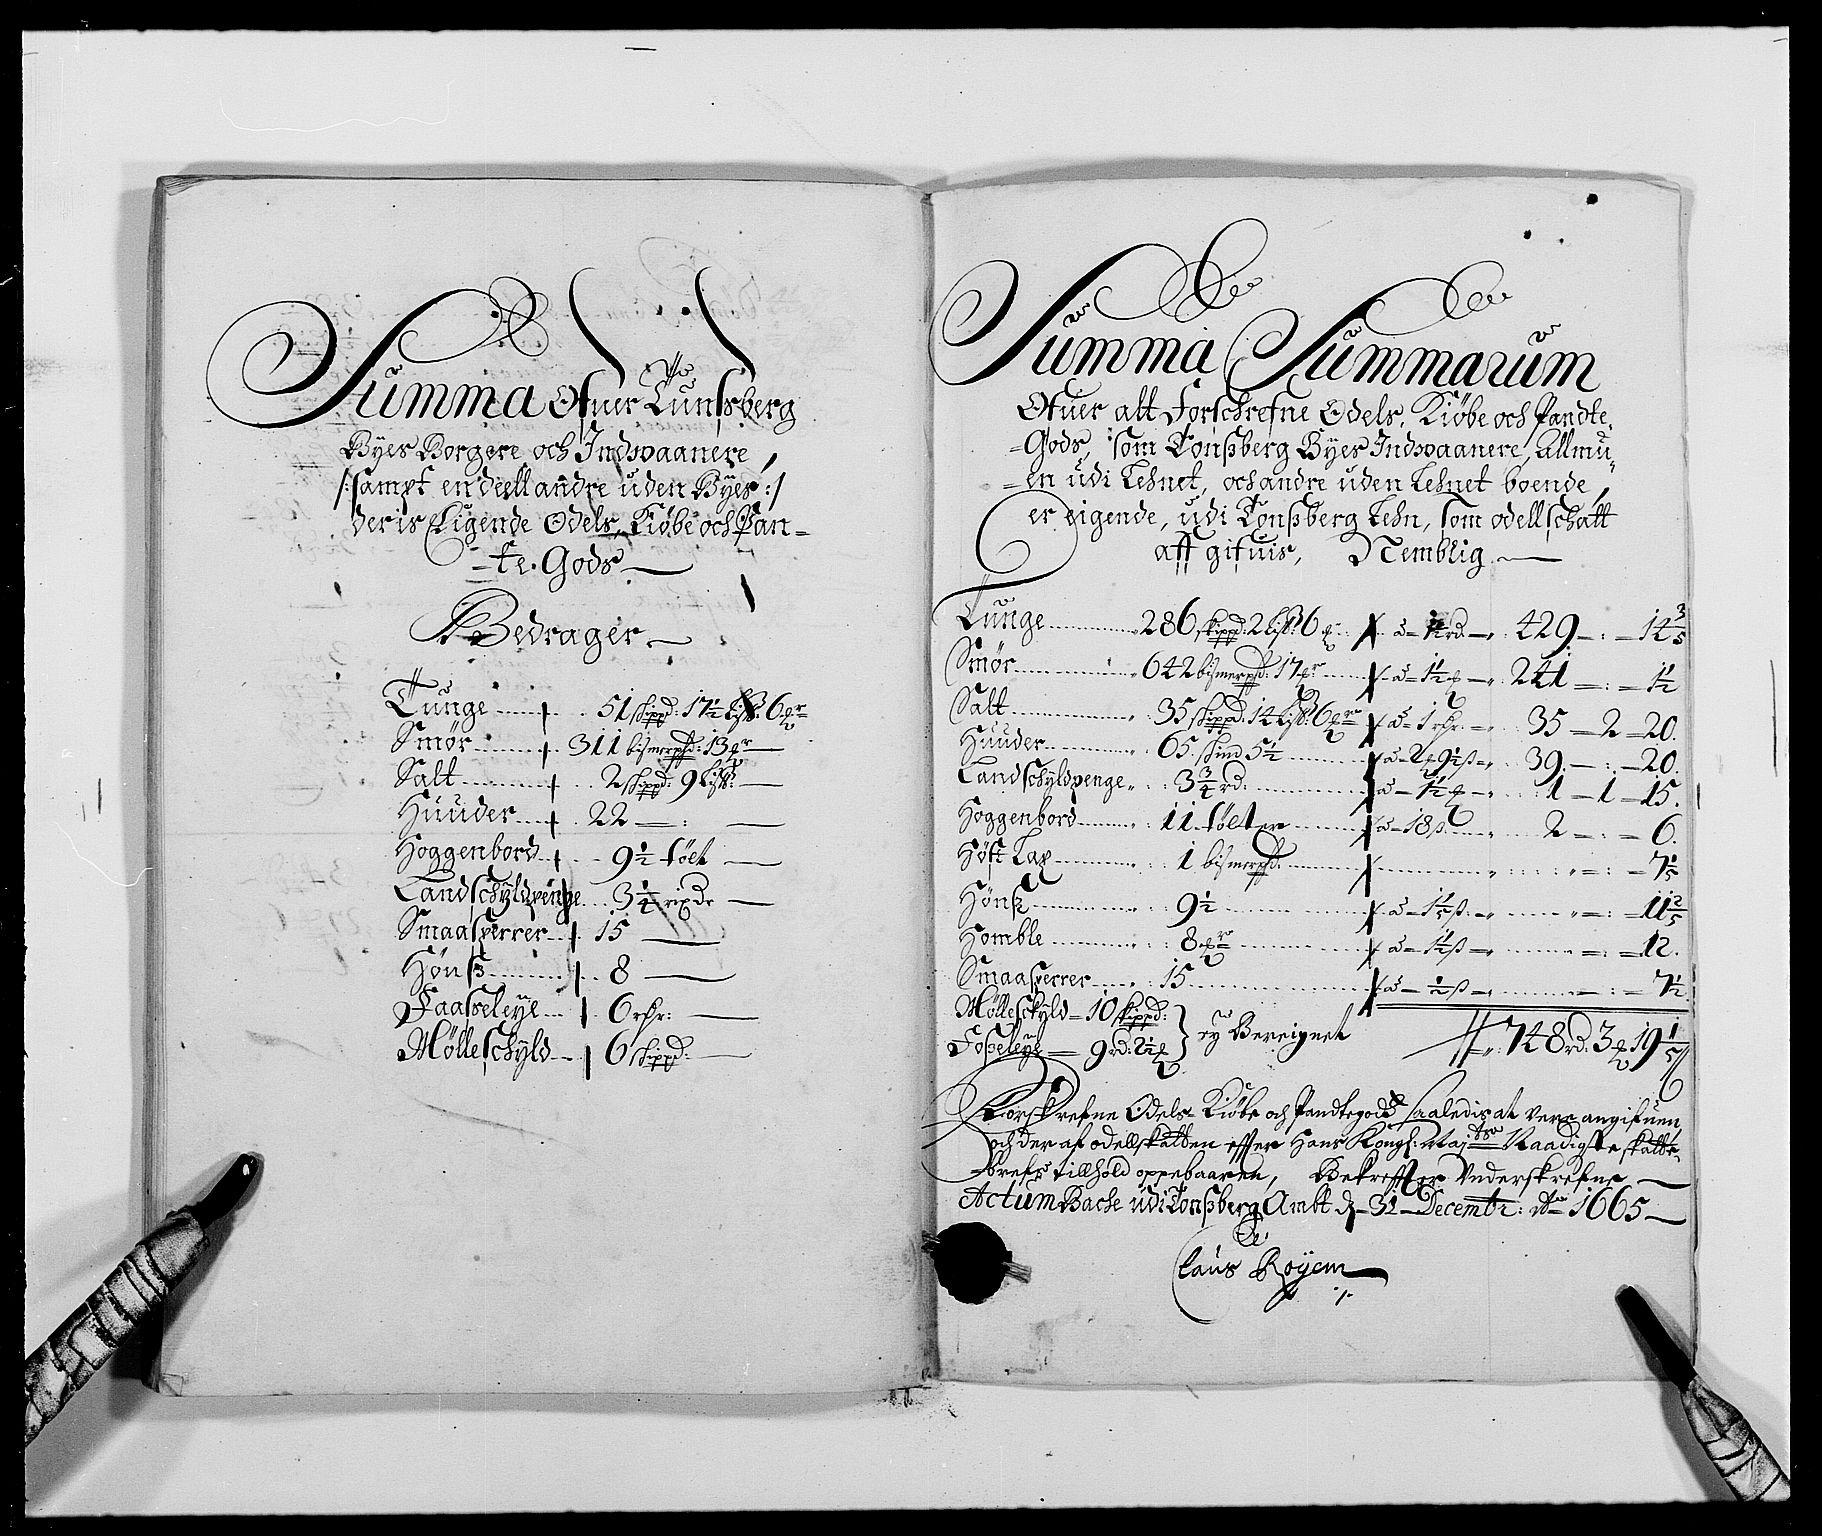 RA, Rentekammeret inntil 1814, Reviderte regnskaper, Fogderegnskap, R32/L1839: Fogderegnskap Jarlsberg grevskap, 1664-1673, s. 336